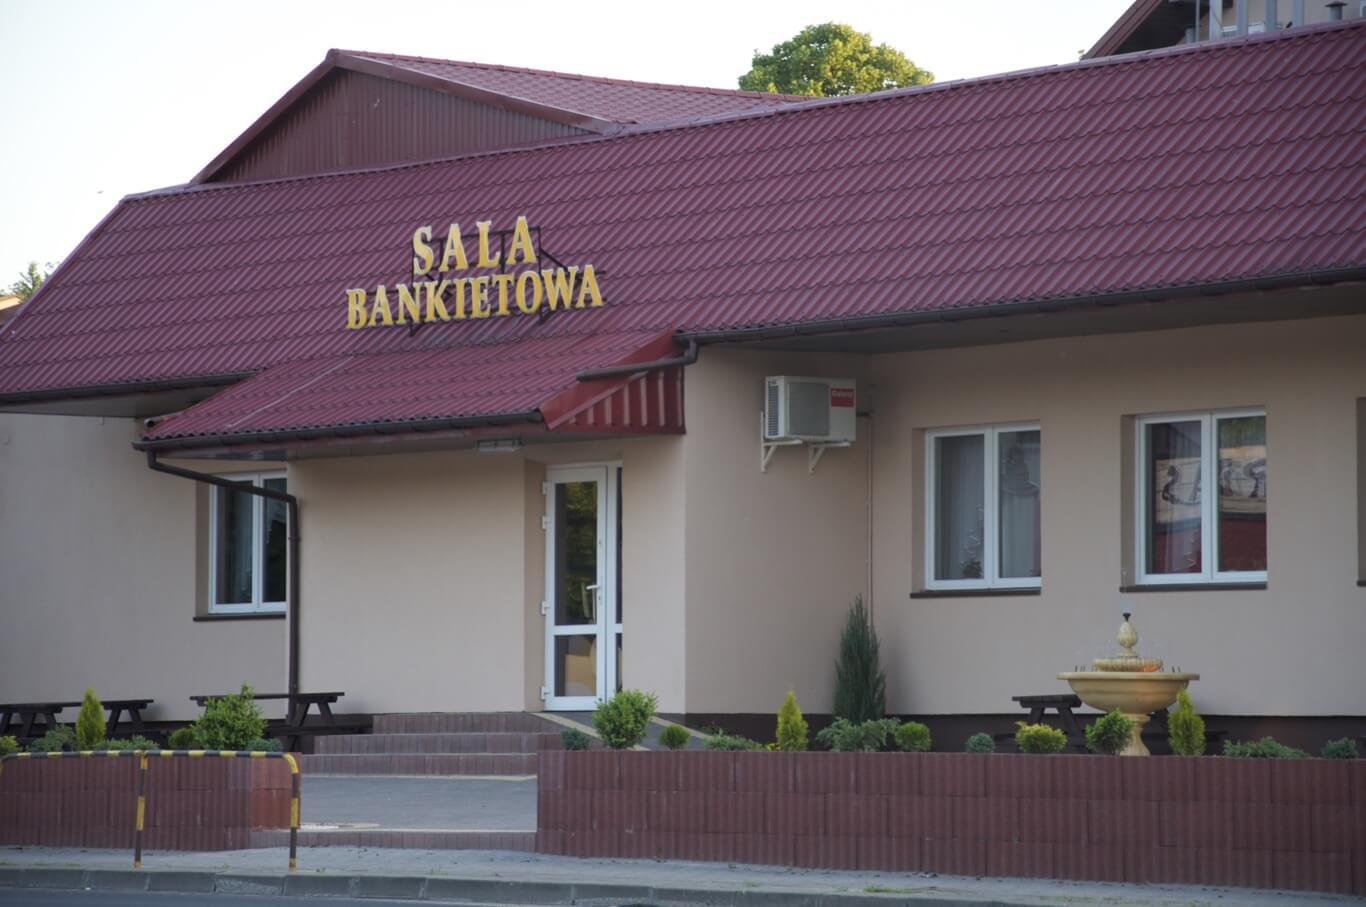 SalaBankietowa 071